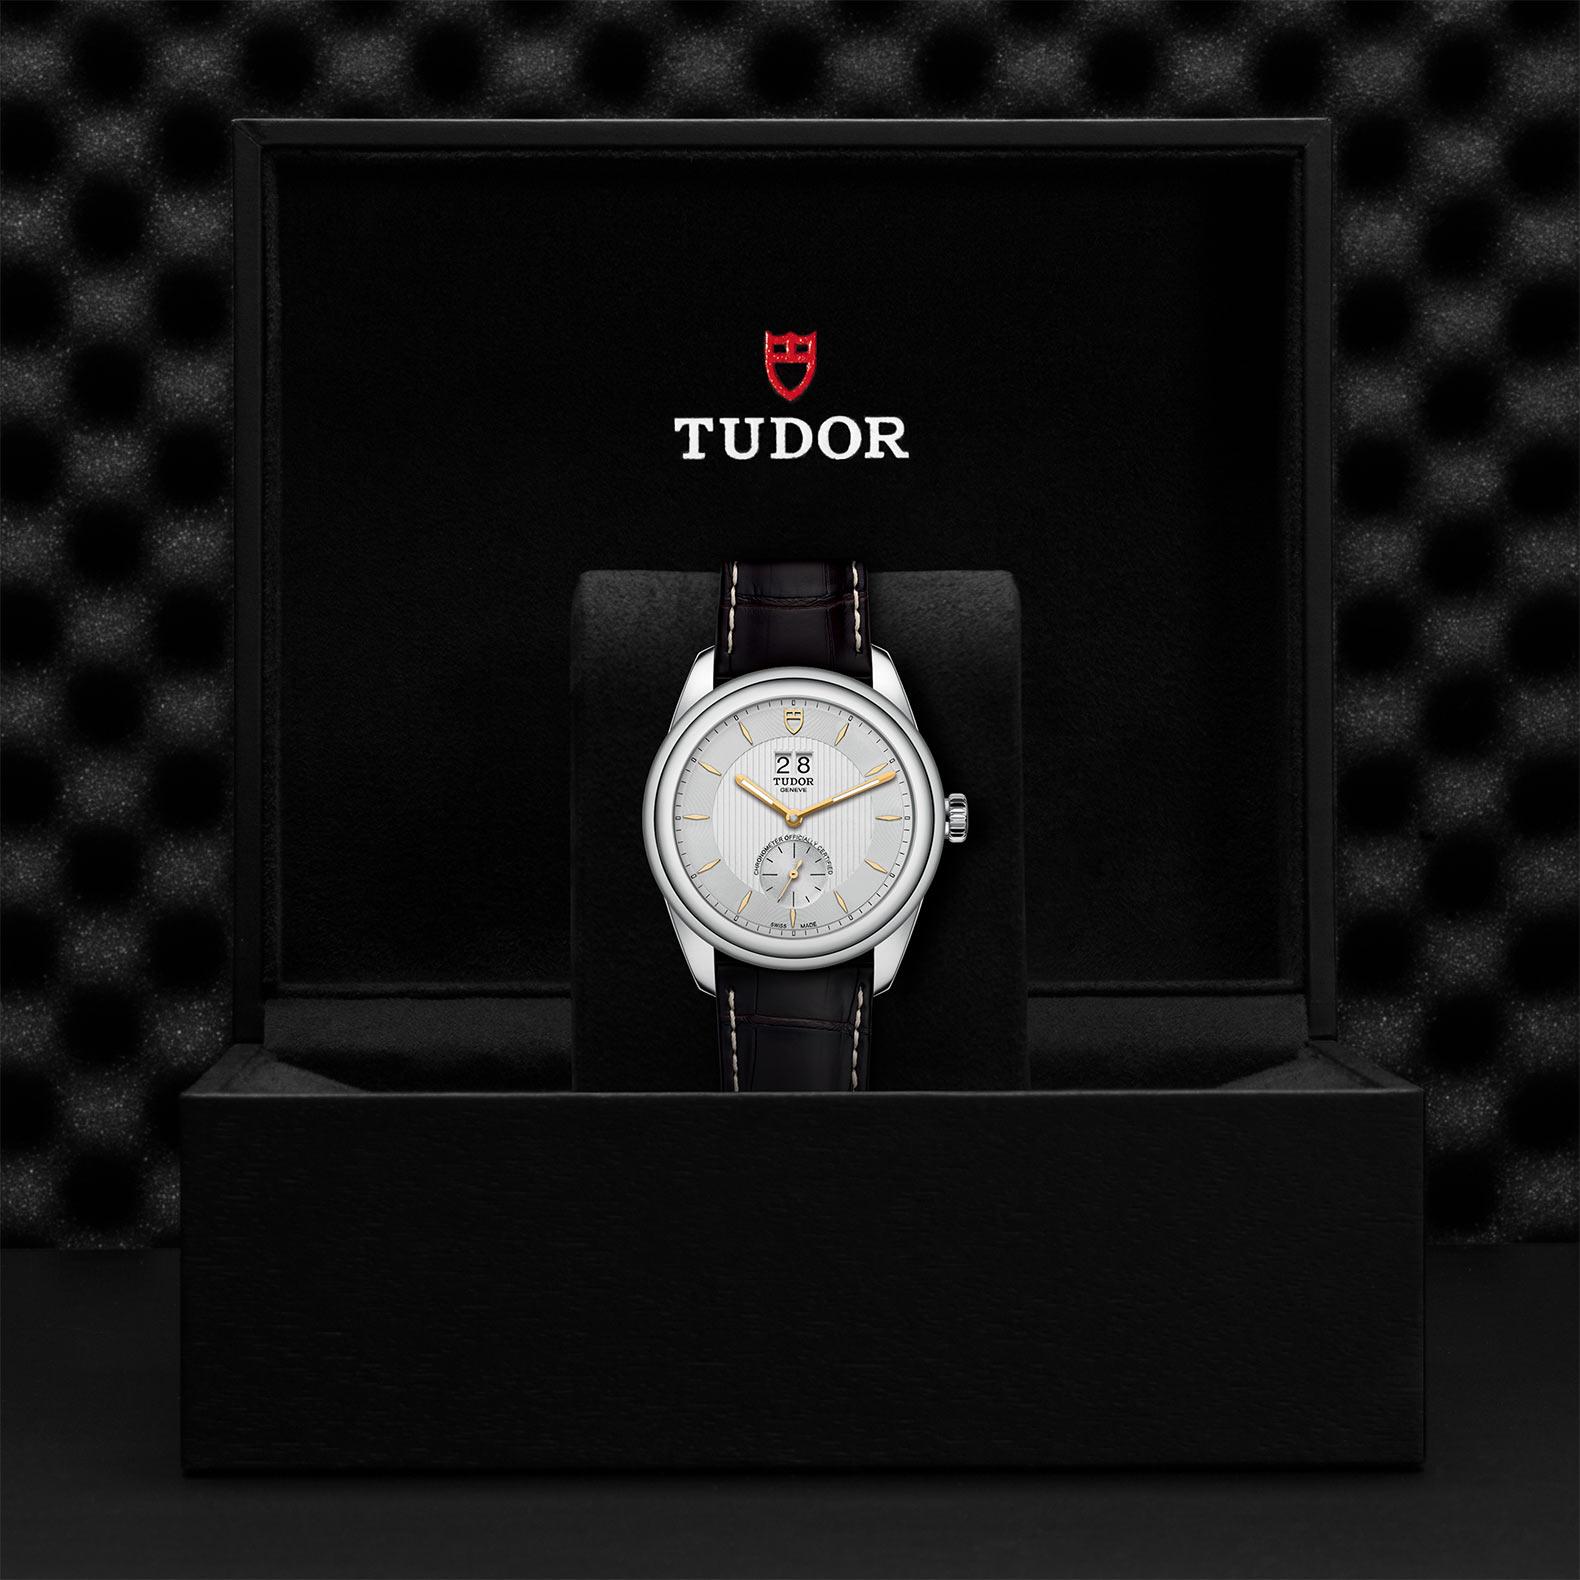 TUDOR Glamour Double Date - M57100-0017